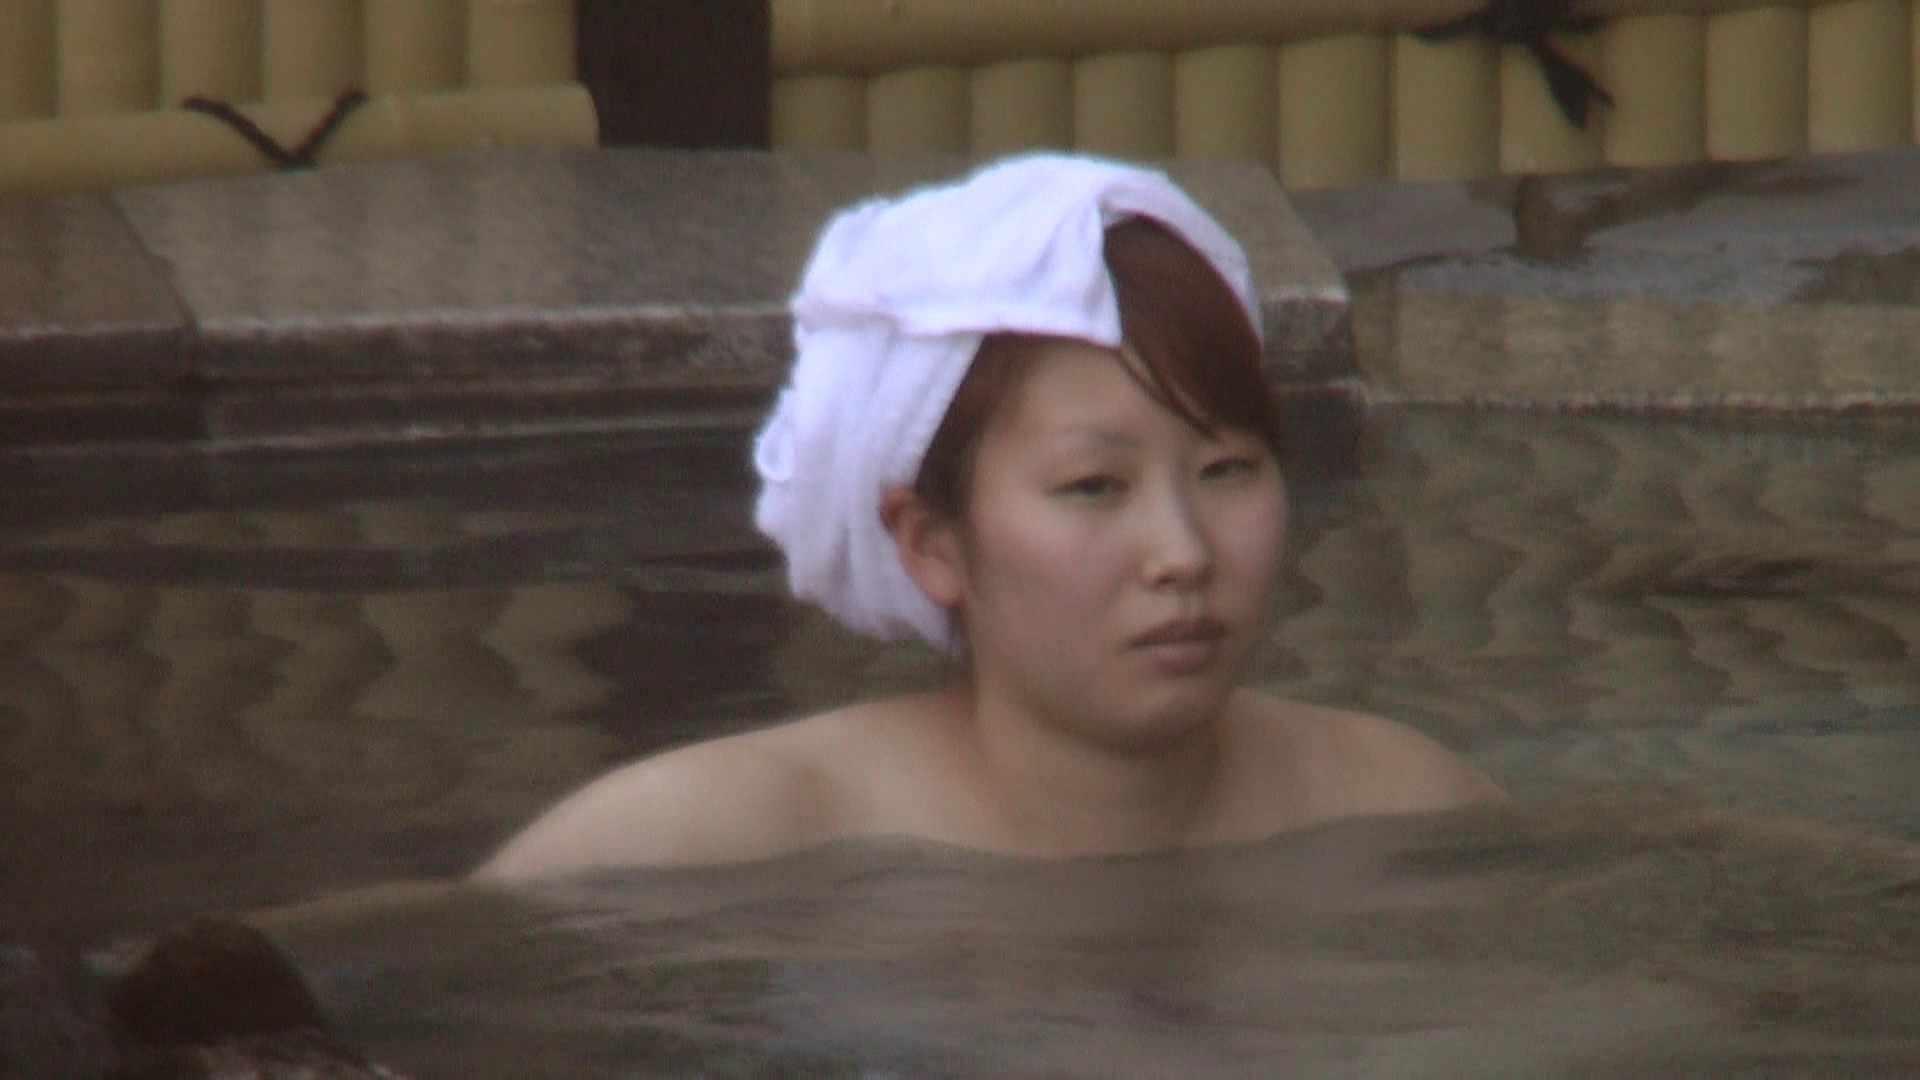 Aquaな露天風呂Vol.210 露天風呂 ワレメ動画紹介 83連発 44